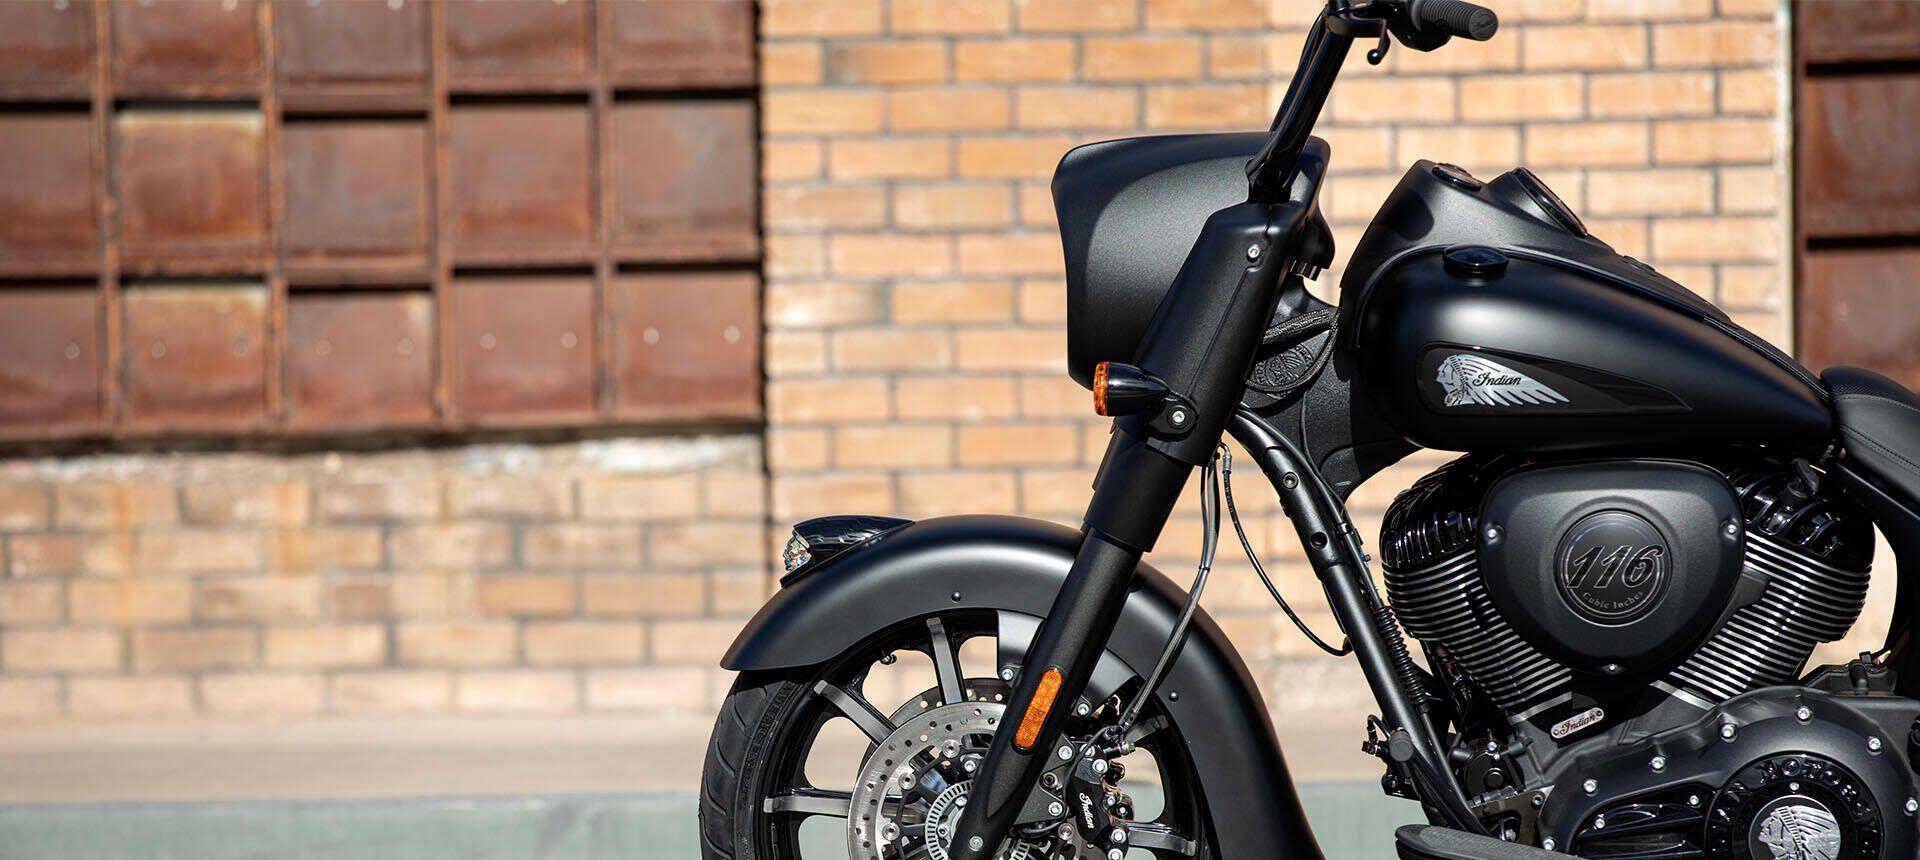 Мотоцикл Indian Springfield Dark Horse Sagebrush Smoke 2020 - 7